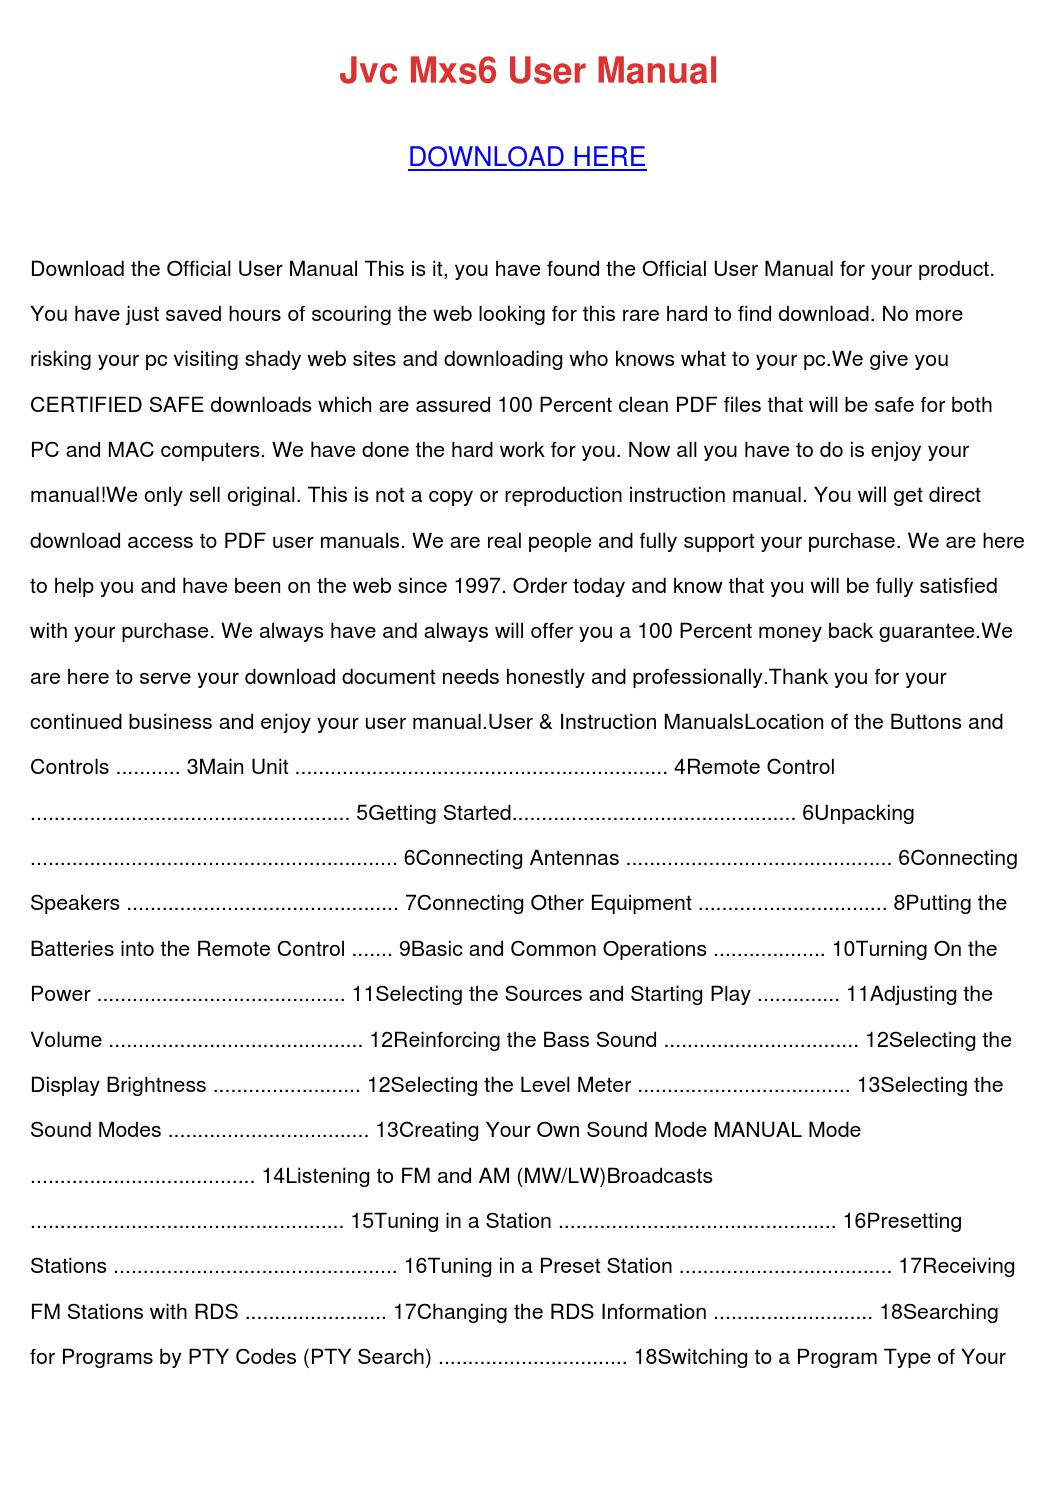 Jvc Mxs6 User Manual by TrudySweet - issuu